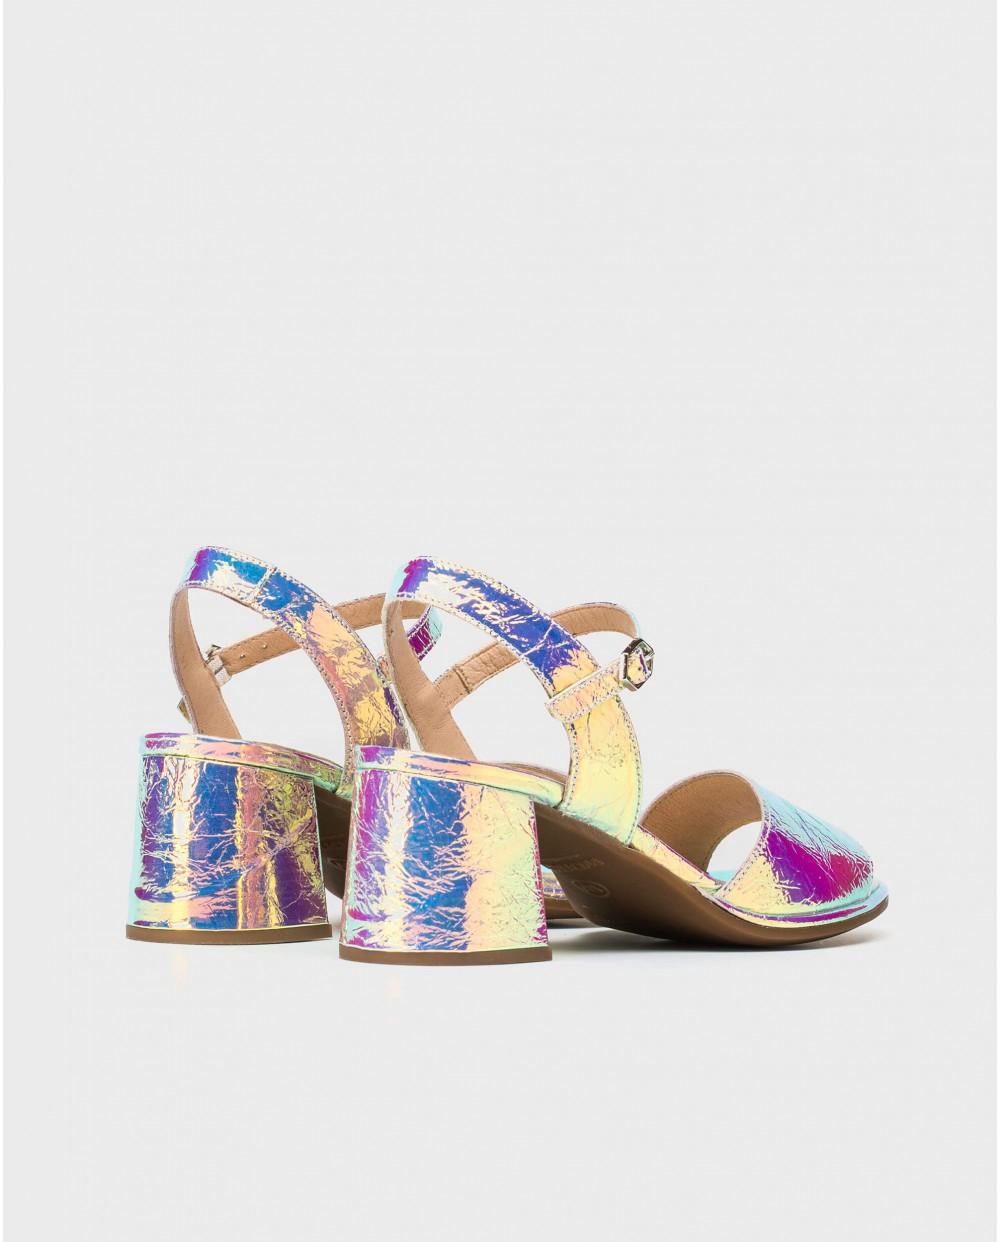 Wonders-Sandals-Laminated leather sandal